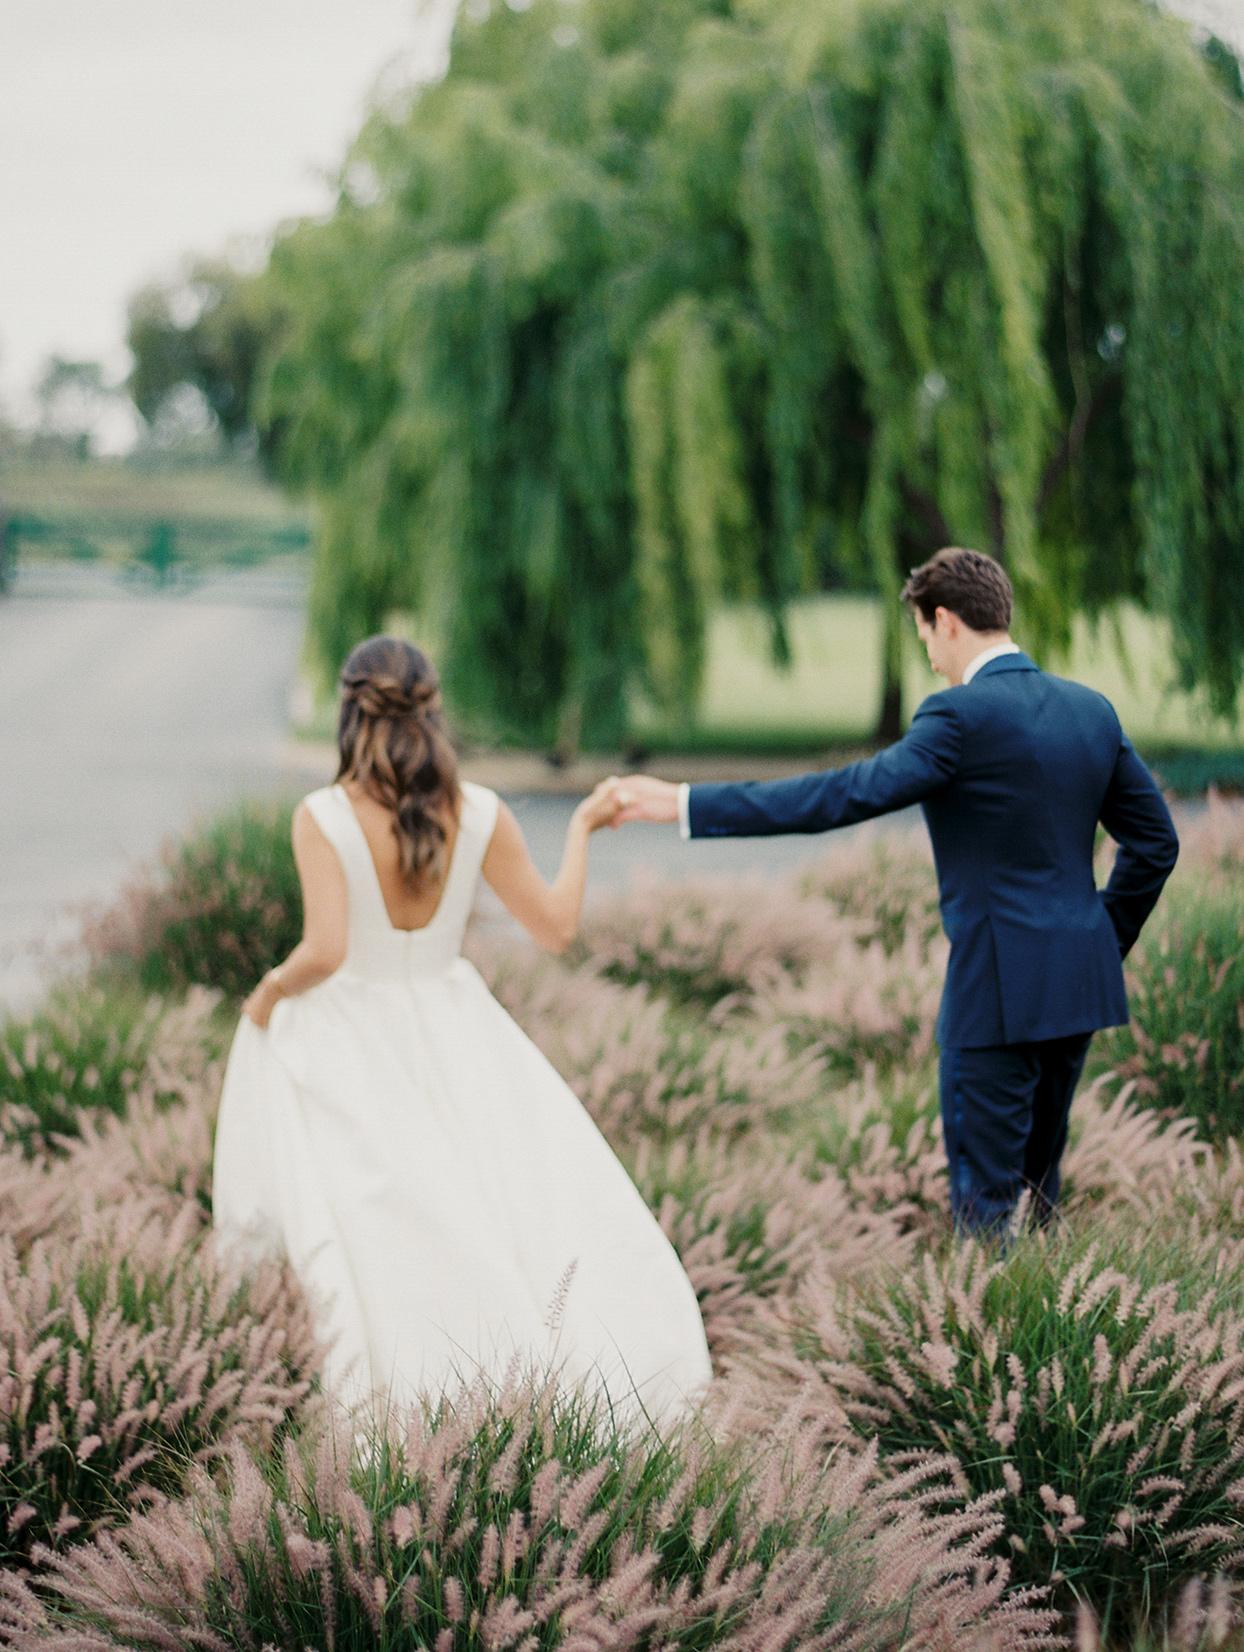 mika steve wedding couple walking through field